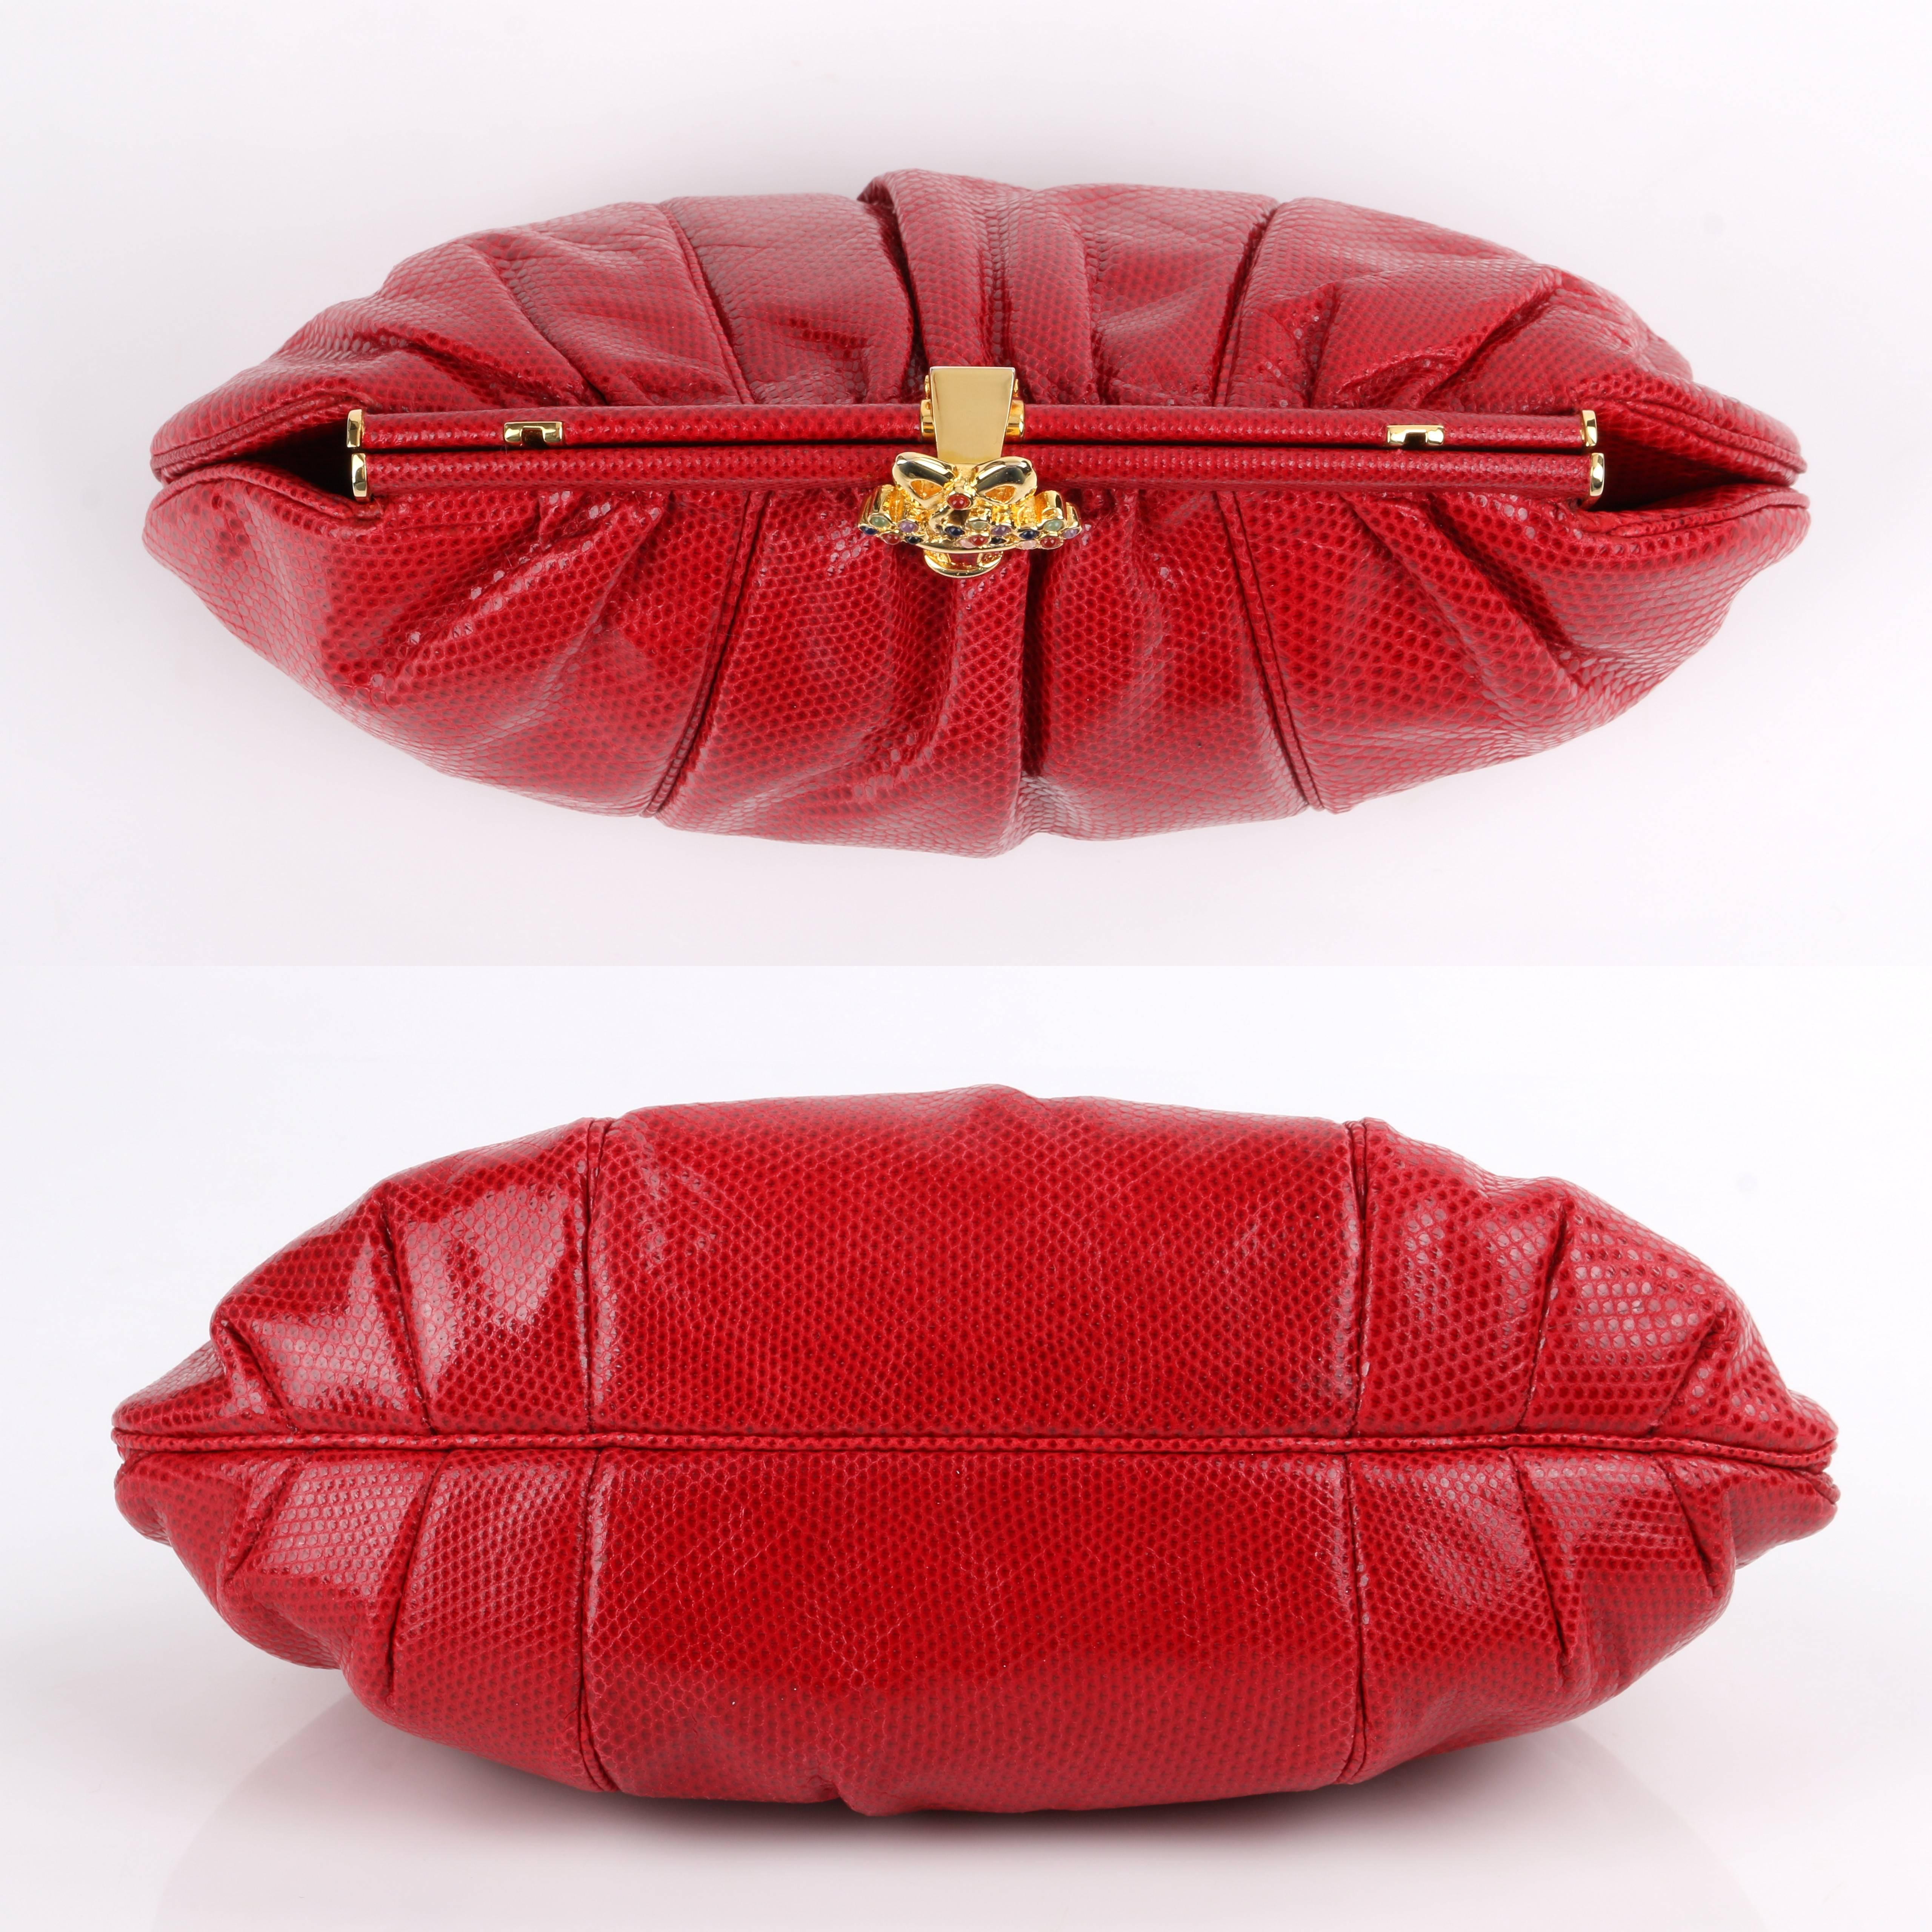 Judith Leiber C.1980s Red Lizard Skin Leather Frame Top Evening Bag Purse eE6k5